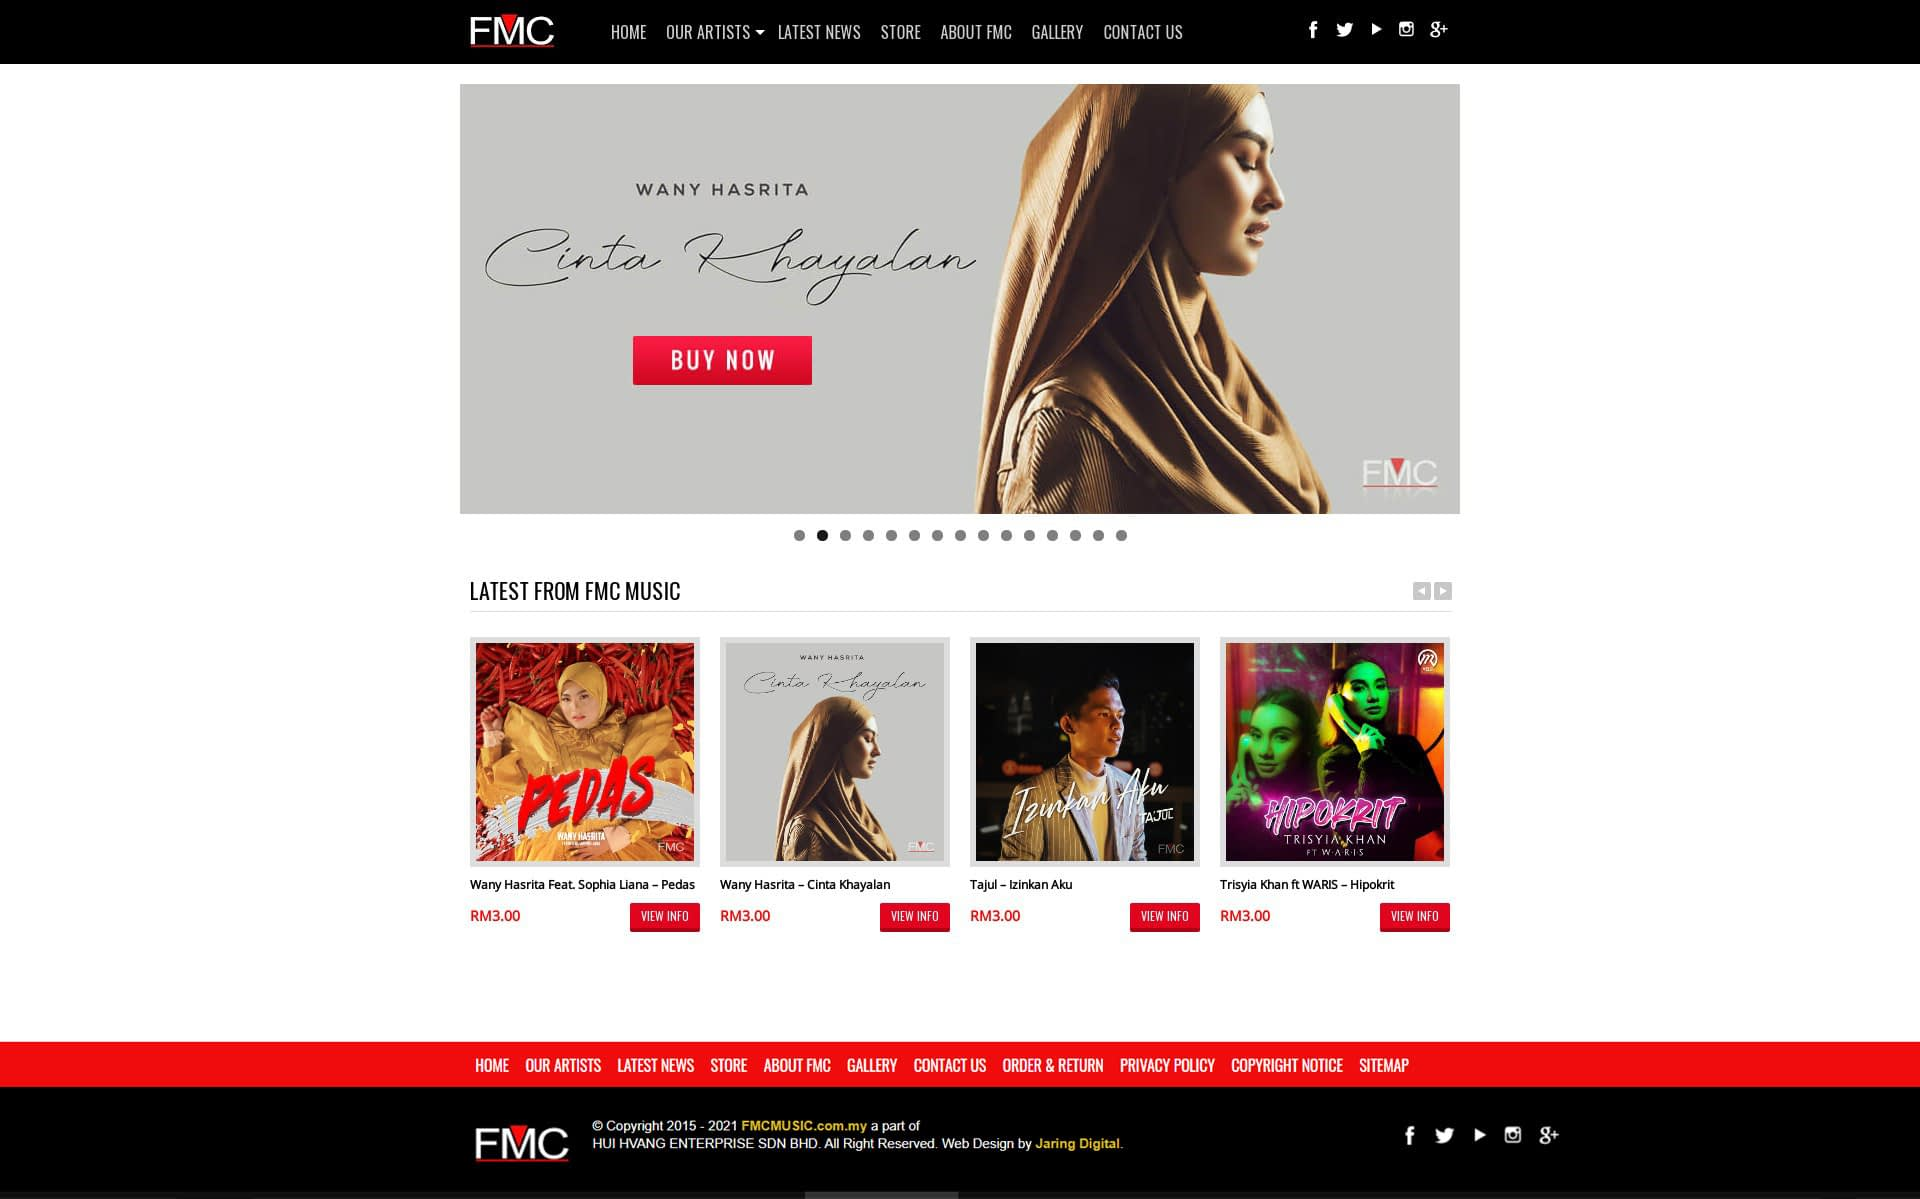 FMC Music - Malaysia Record Label